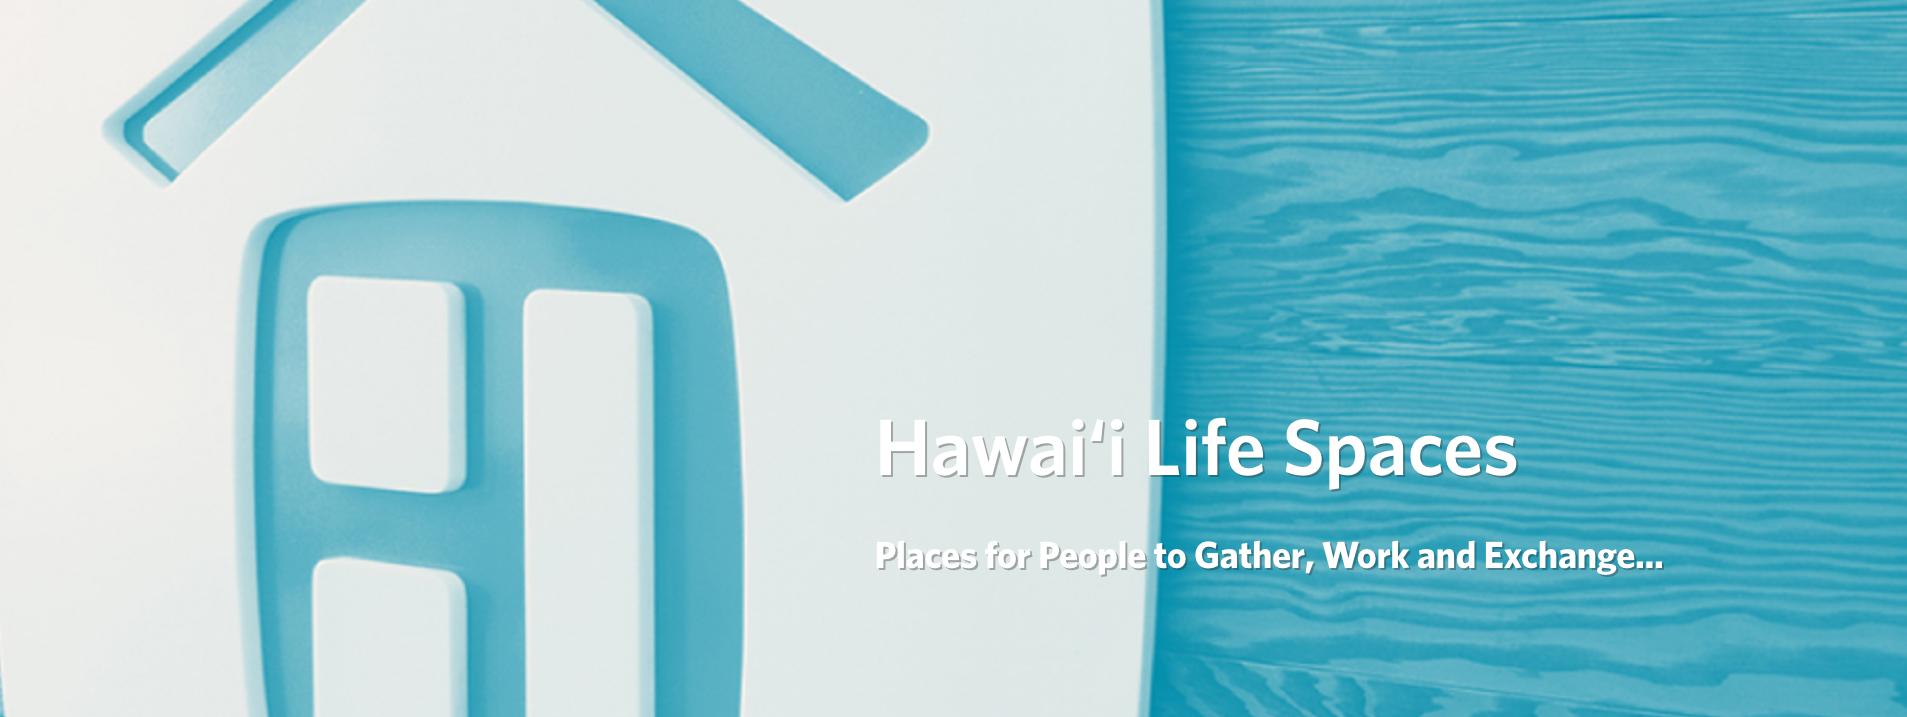 Hawaii Life Real Estate Brokers reviews | Real Estate Agents at 4614 Kilauea Ave #206 - Honolulu HI